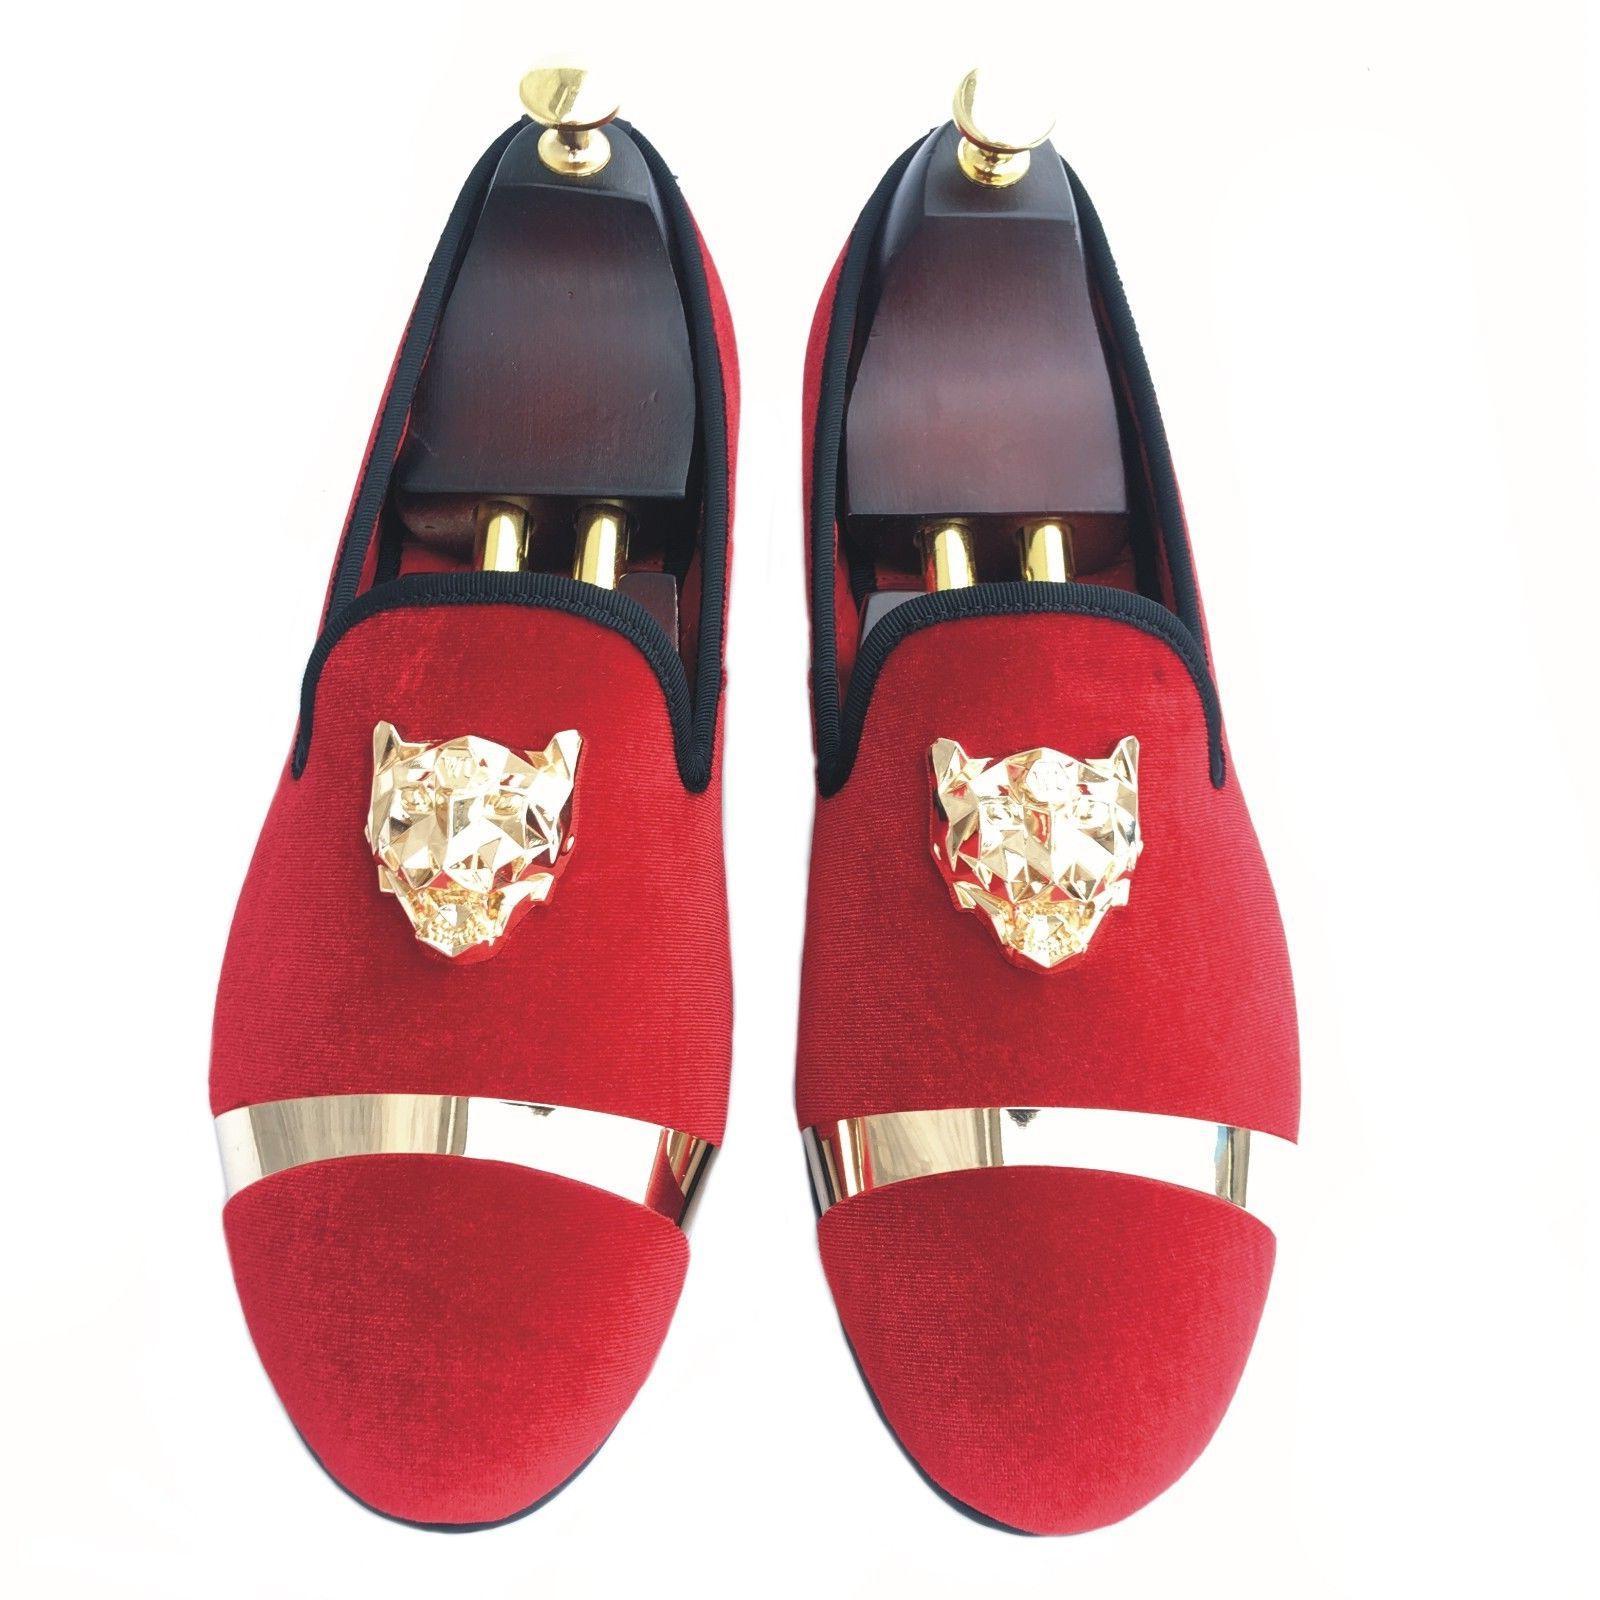 Handmade Velvet Slippers with Gold Buckle Wedding Dress Shoes New